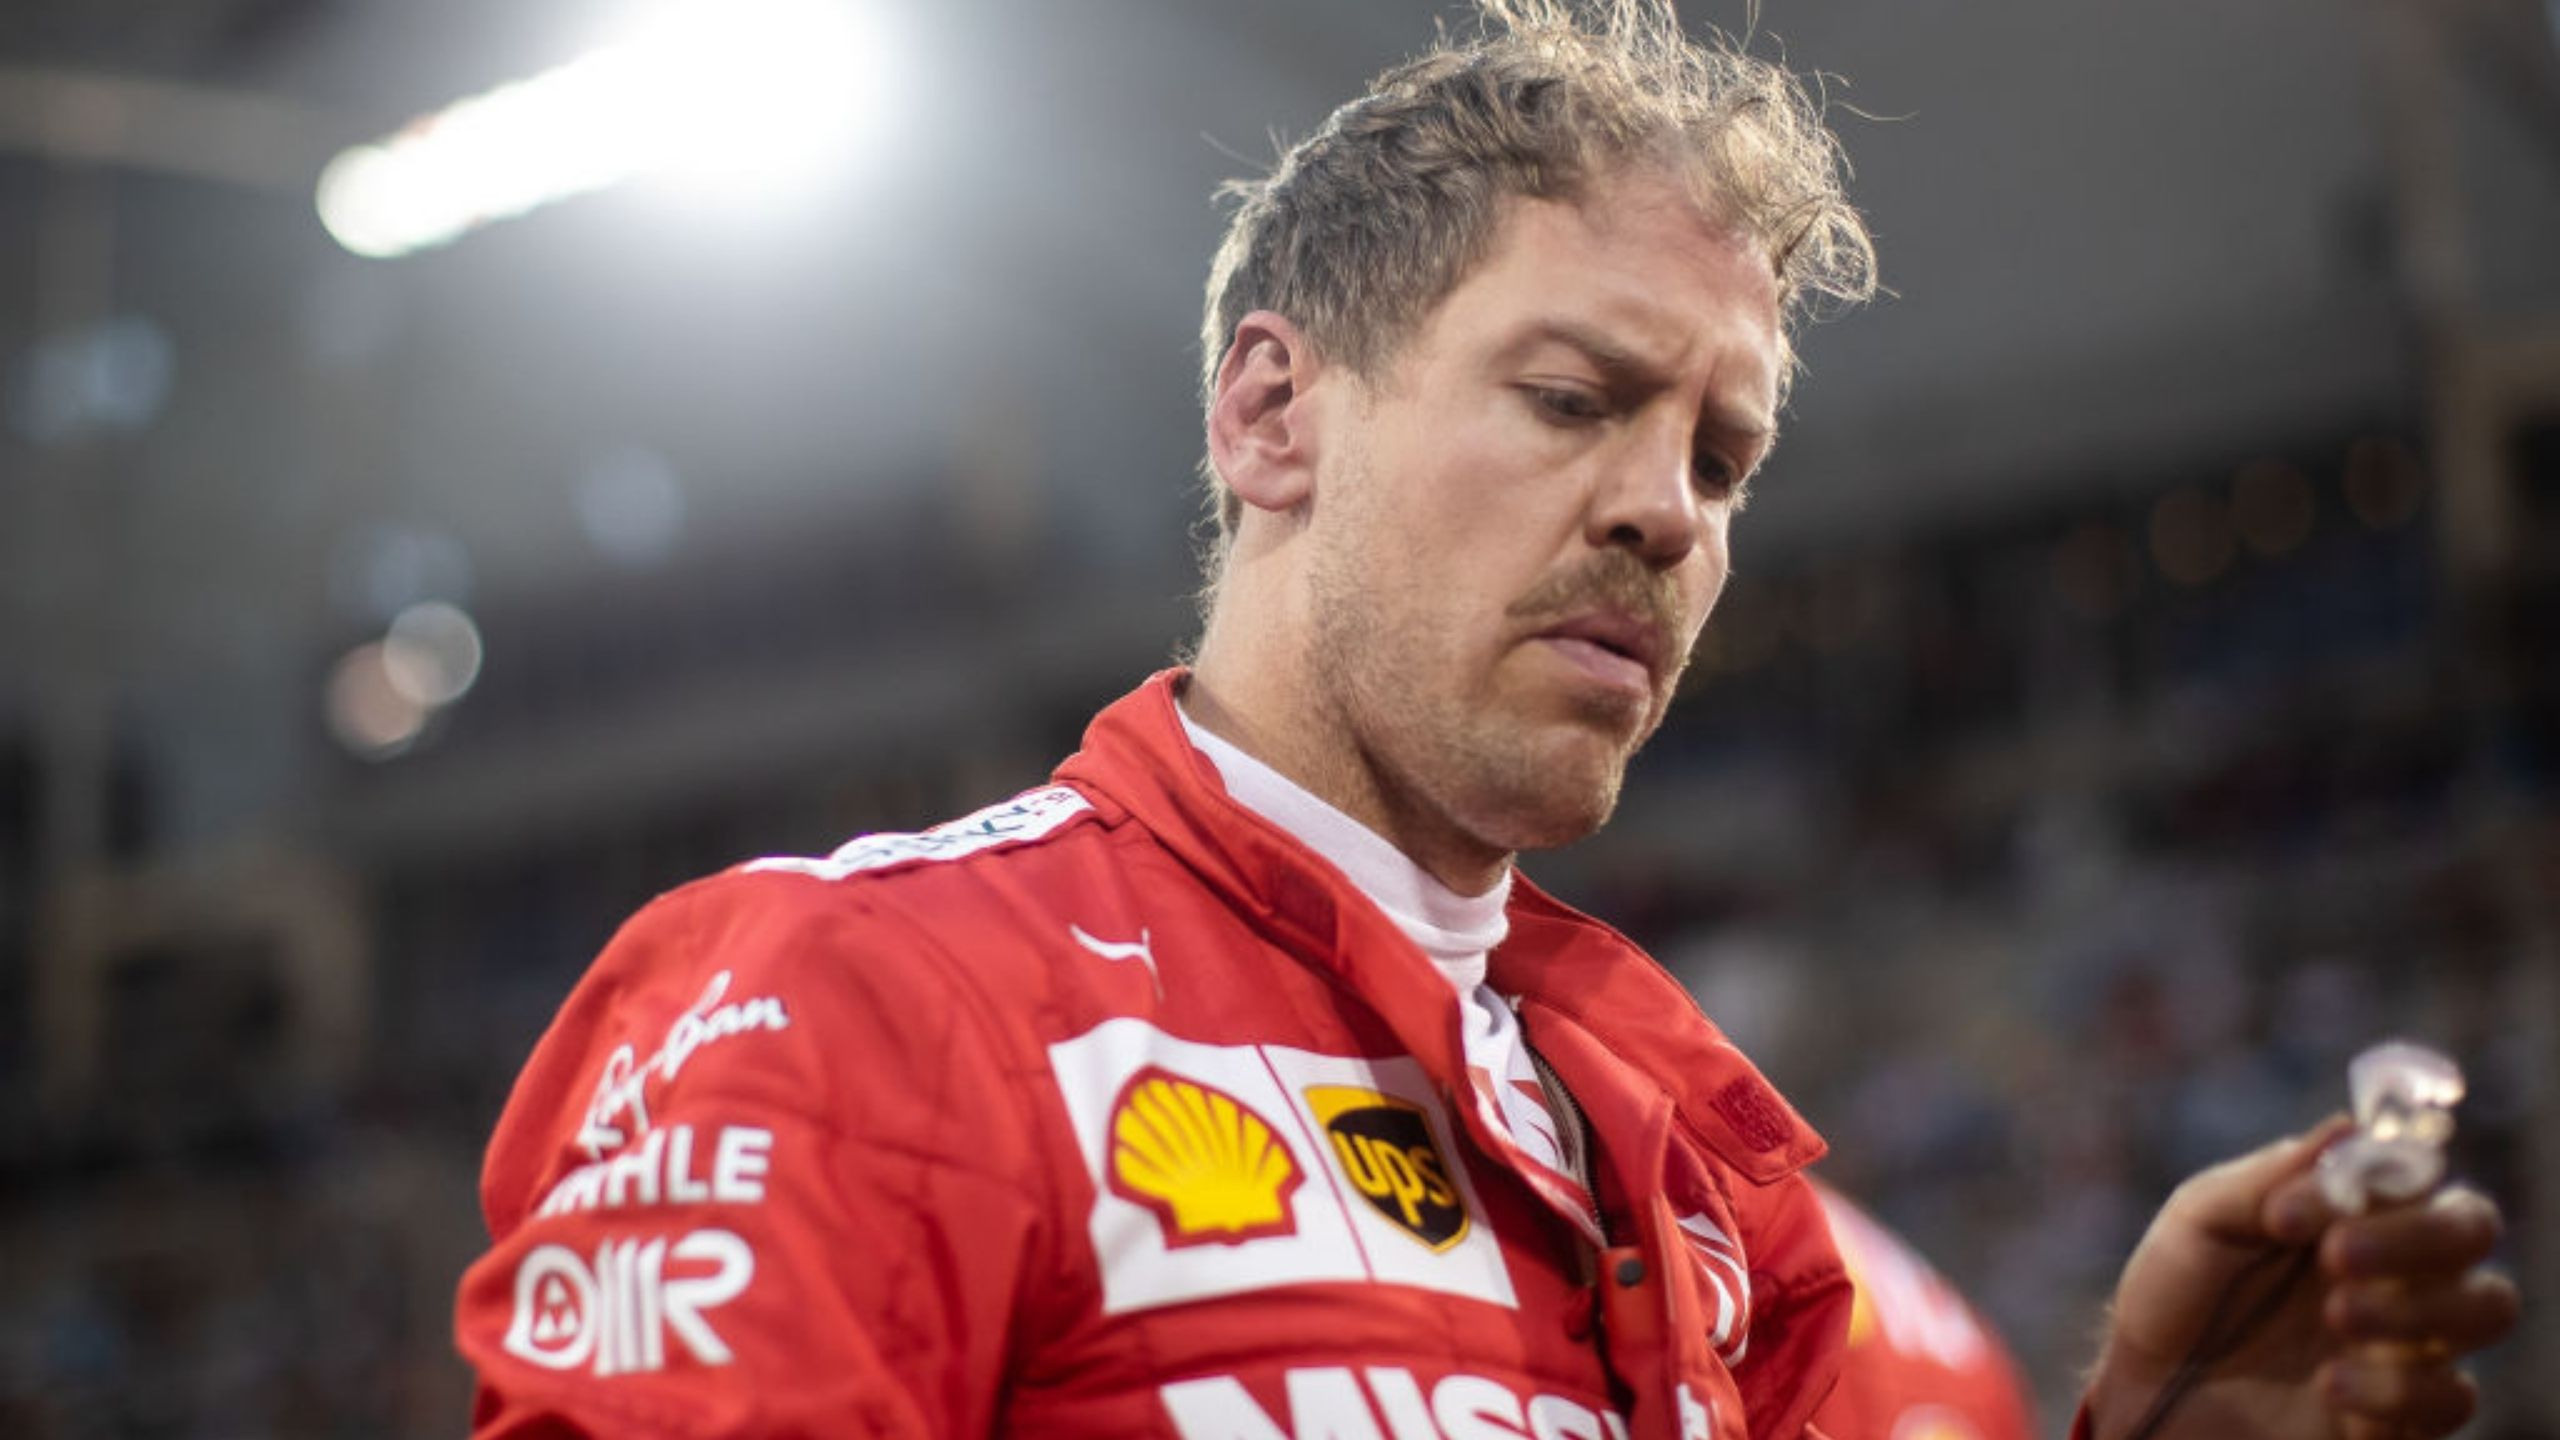 """He's the third-most winning driver in Ferrari history"" - Ferrari Sporting Director Laurent Mekies thanks Sebastian Vettel for keeping the team together in 2020"